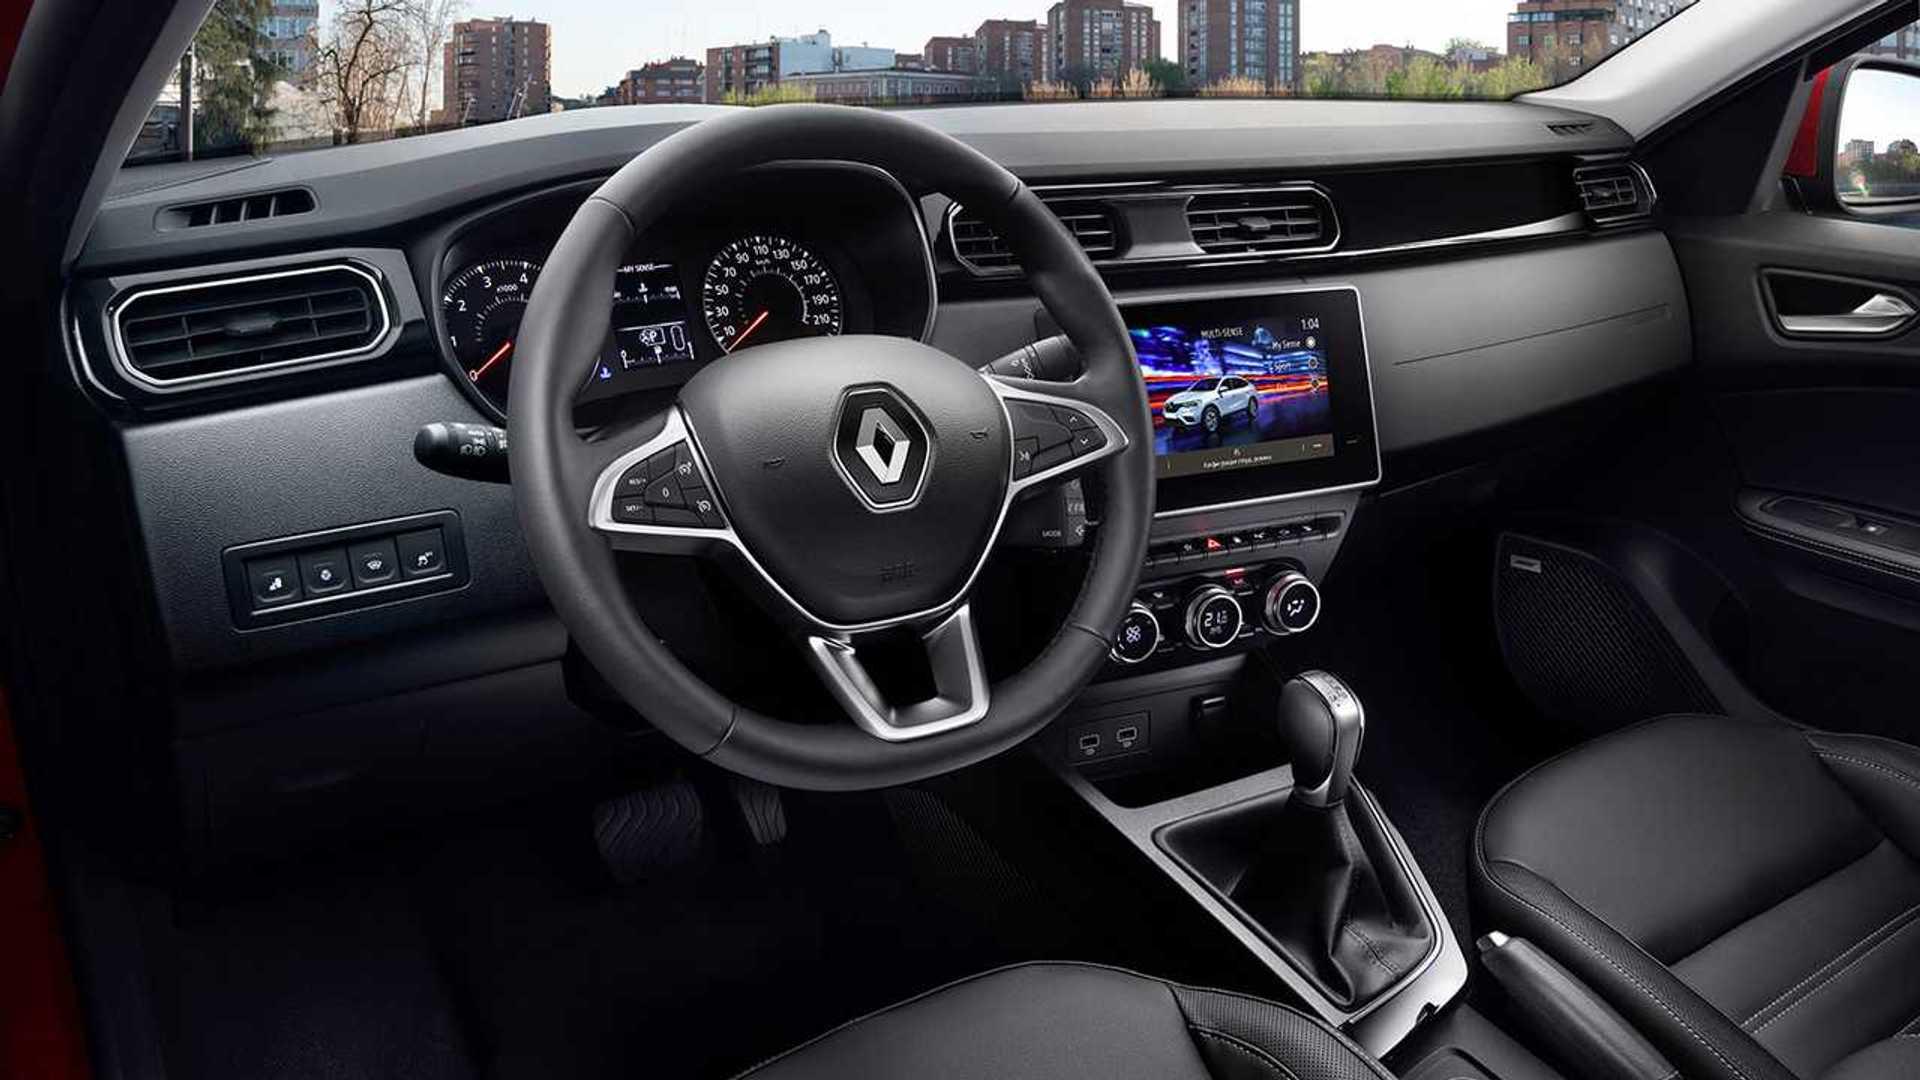 2019 - [Renault] Arkana [LJC] - Page 18 2019-renault-arkana